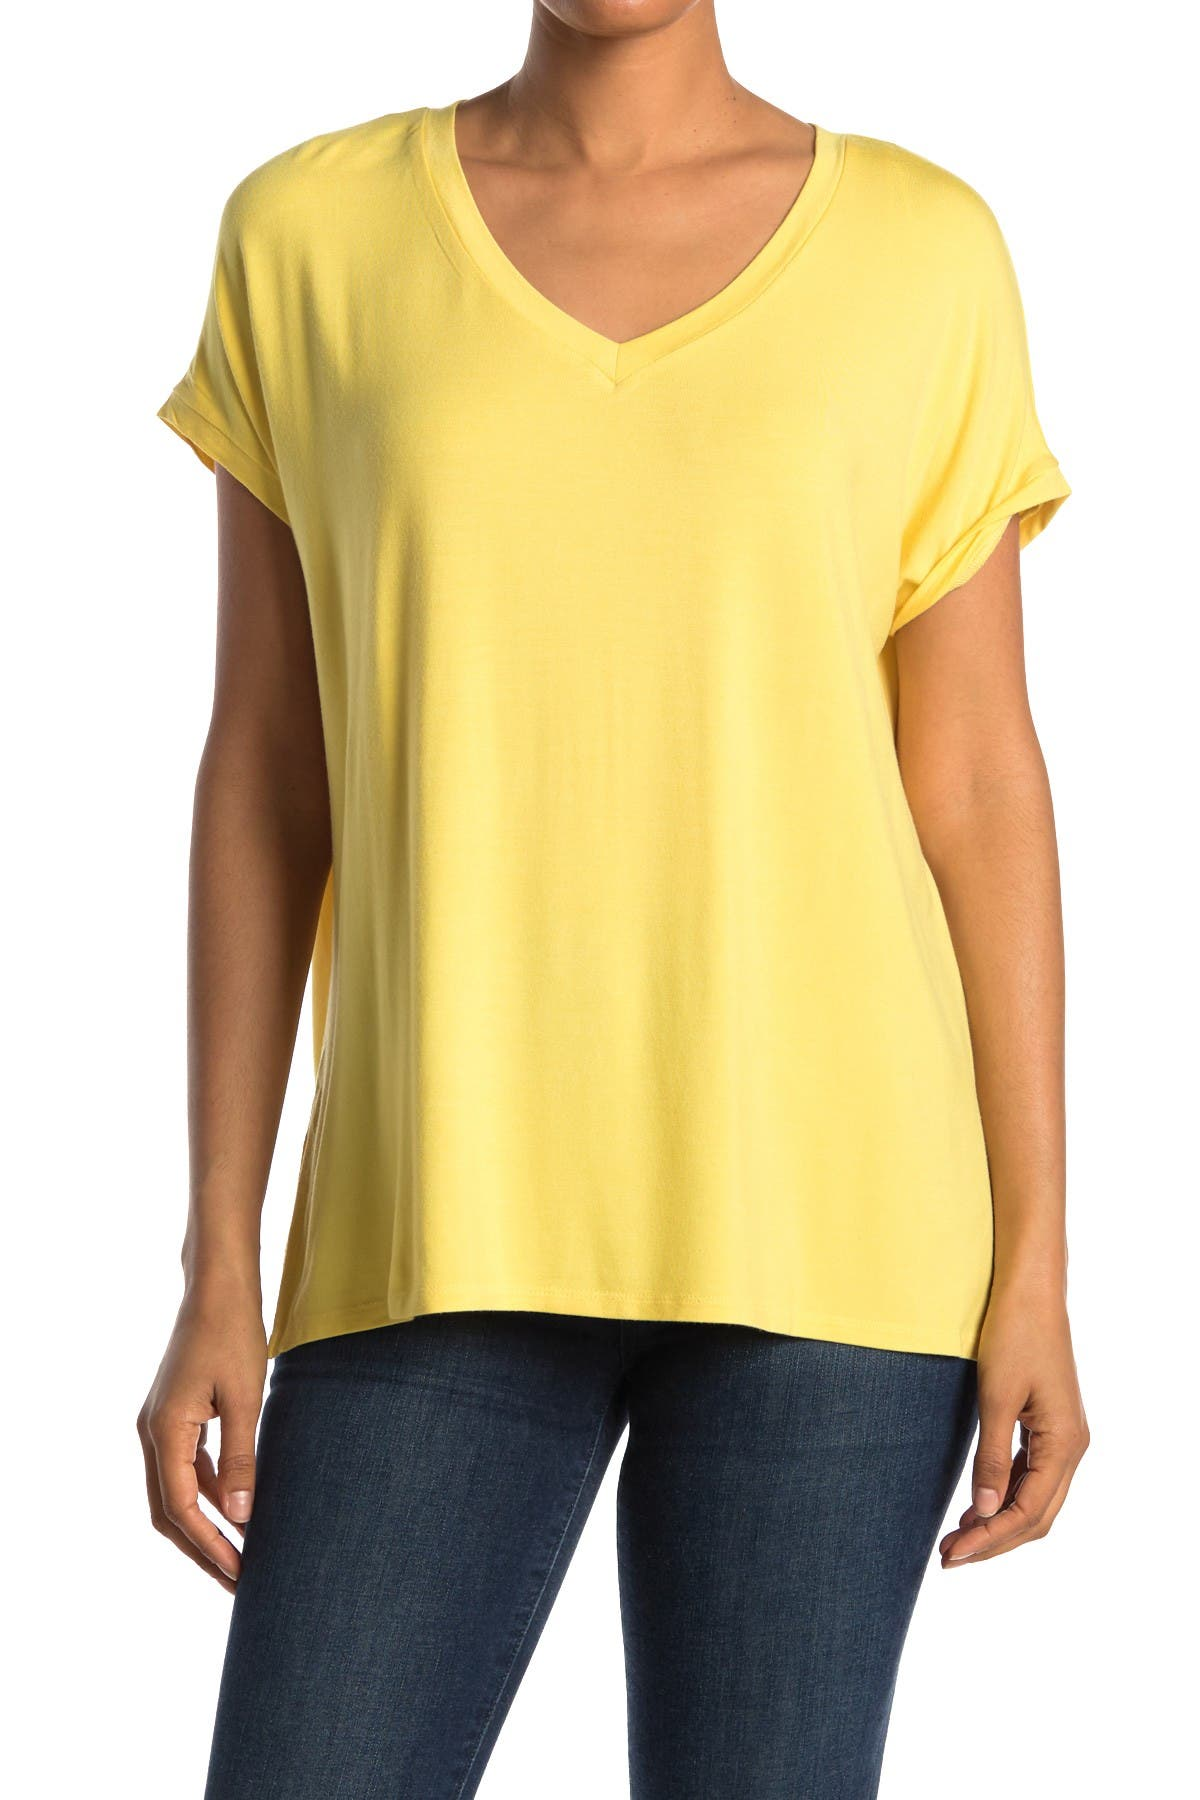 Image of M Magaschoni Dolman Sleeve Side Vent V-Neck Shirt